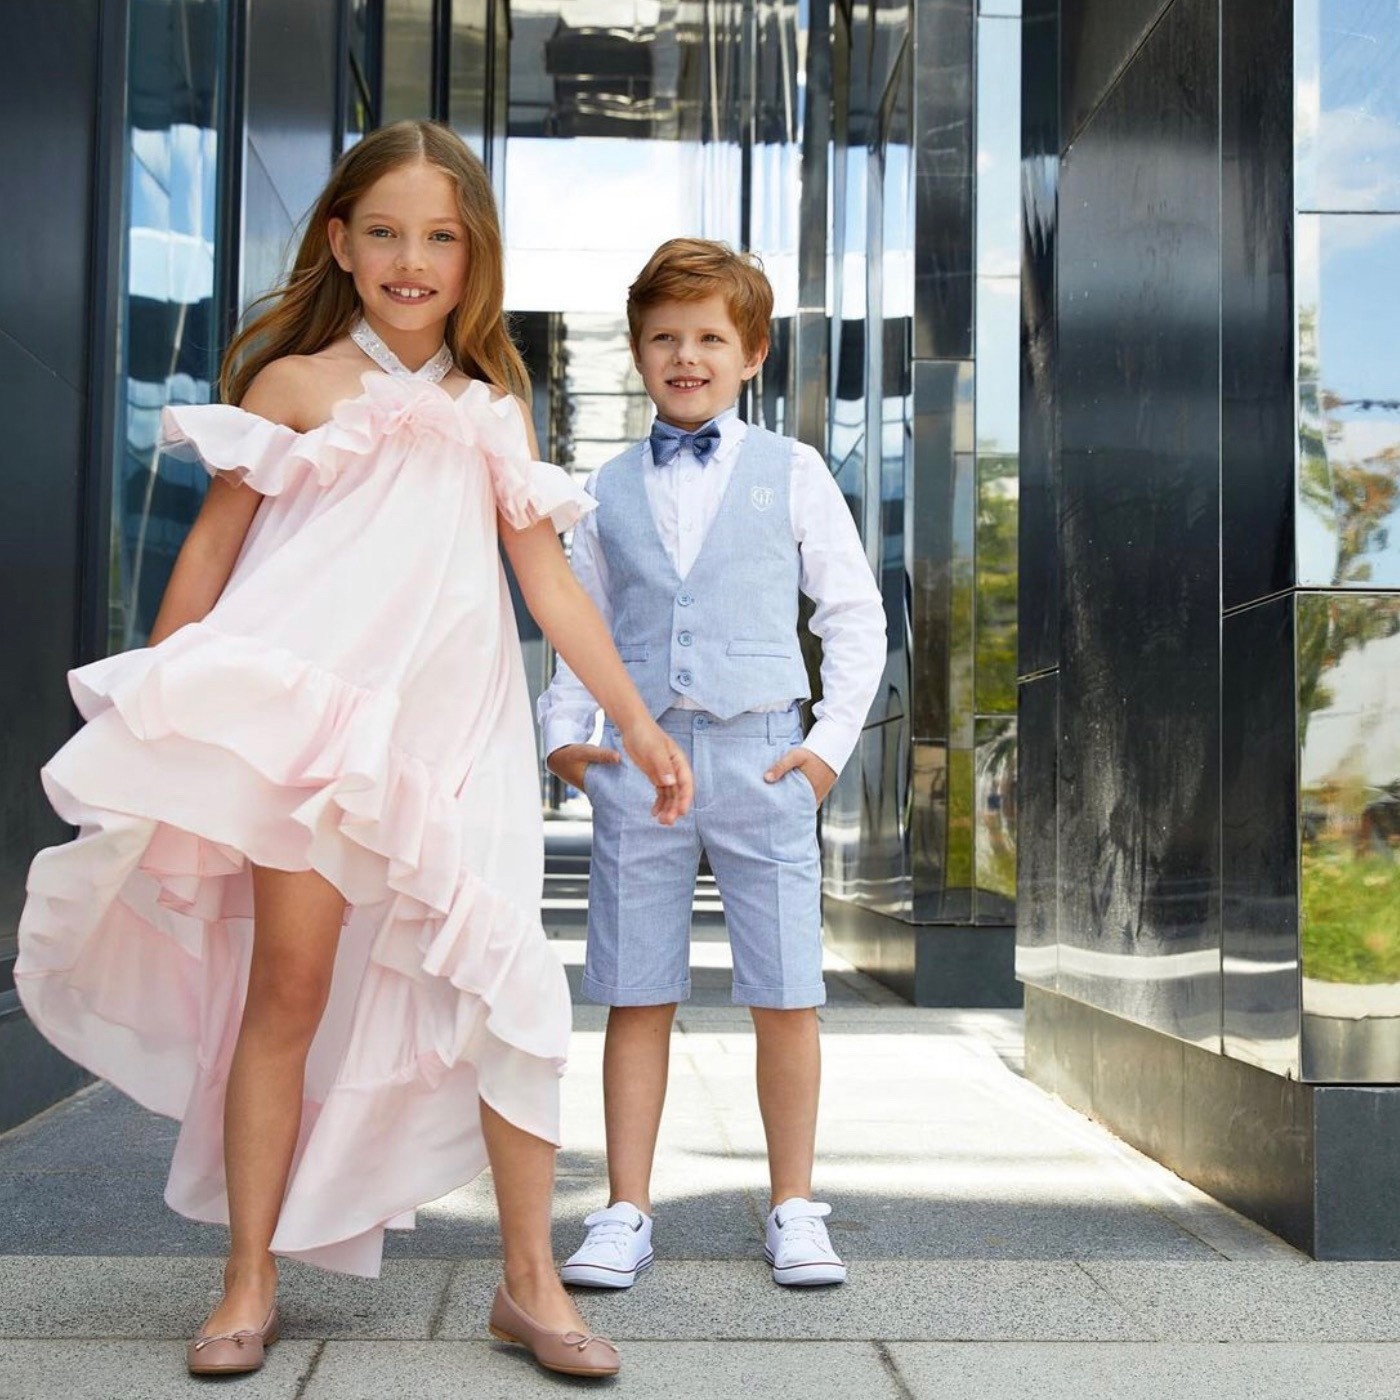 Cute clothes for kids in Dalma